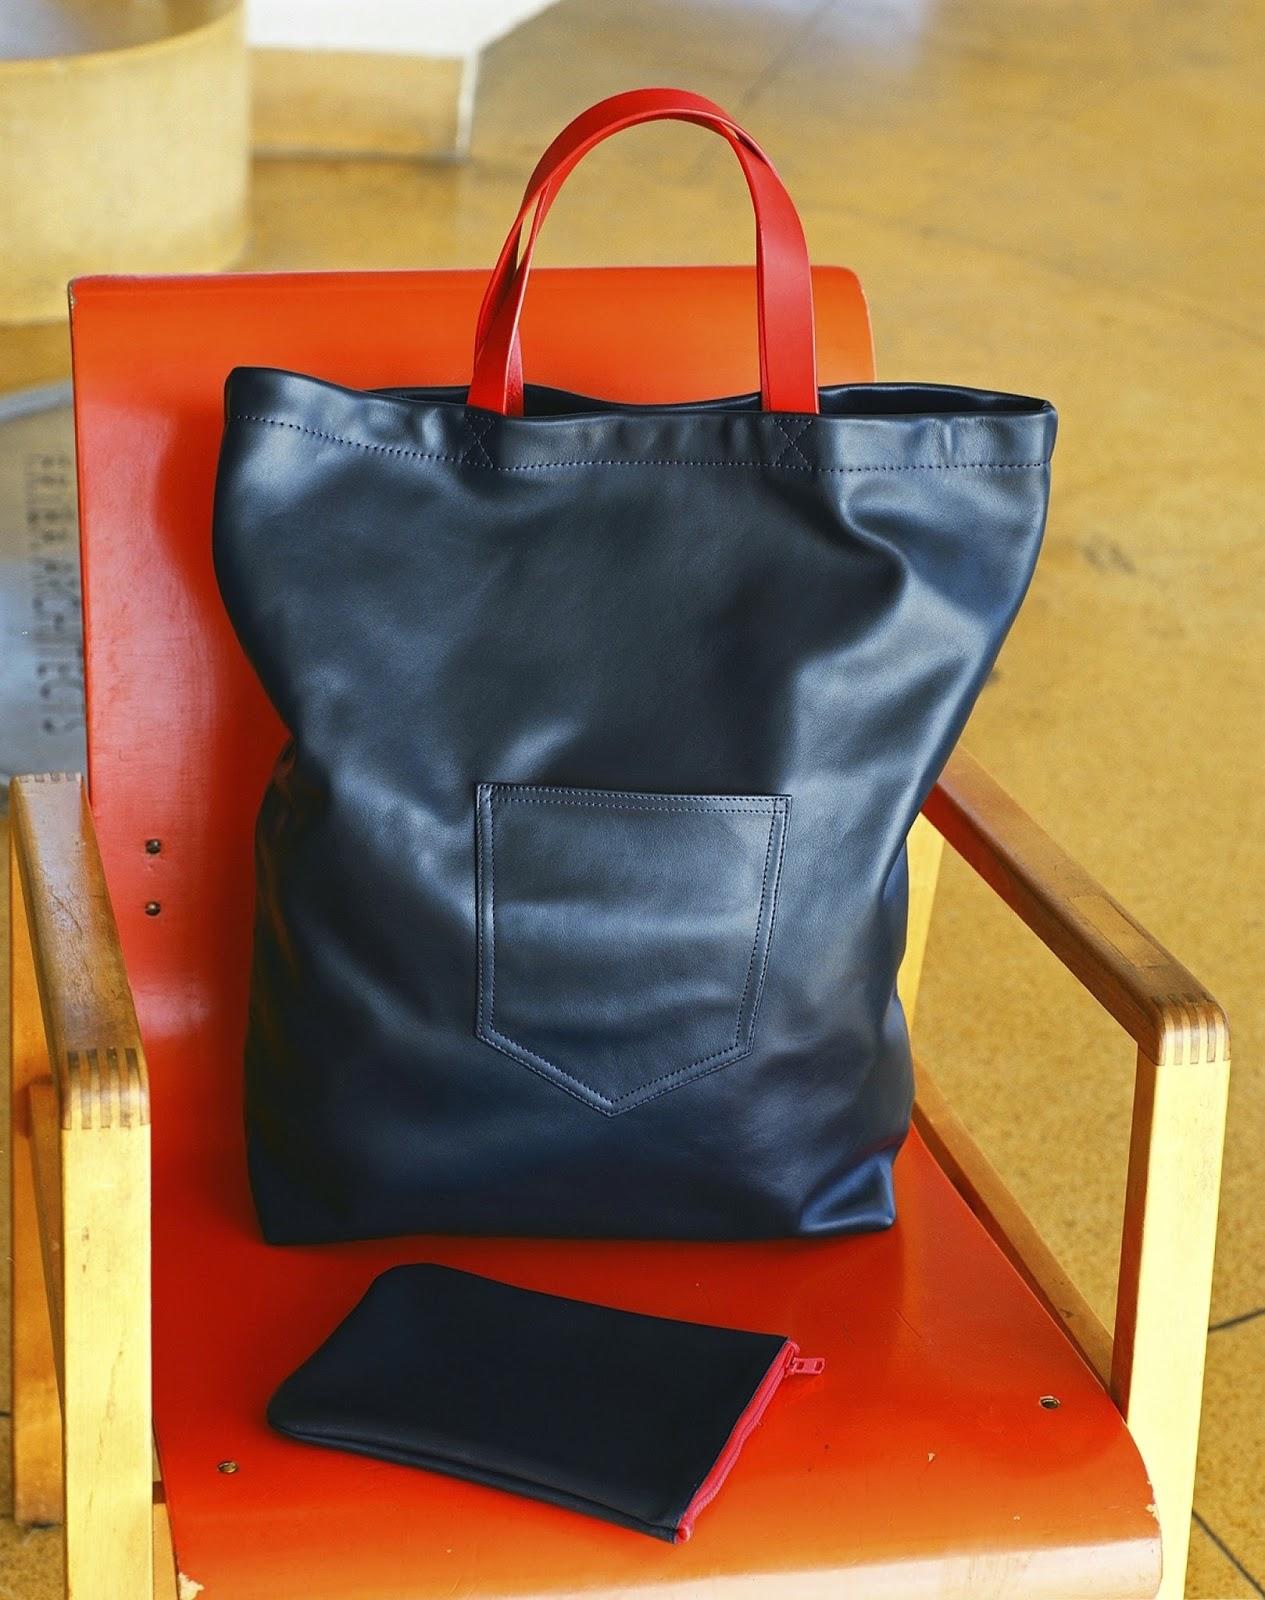 The Nose Bag © Concrete Collaborations, Concrete Editions, Maiko Dawson, Resolve An intimate survey of work, De La Warr Pavilion, Italian Veneto Leather, Accessories